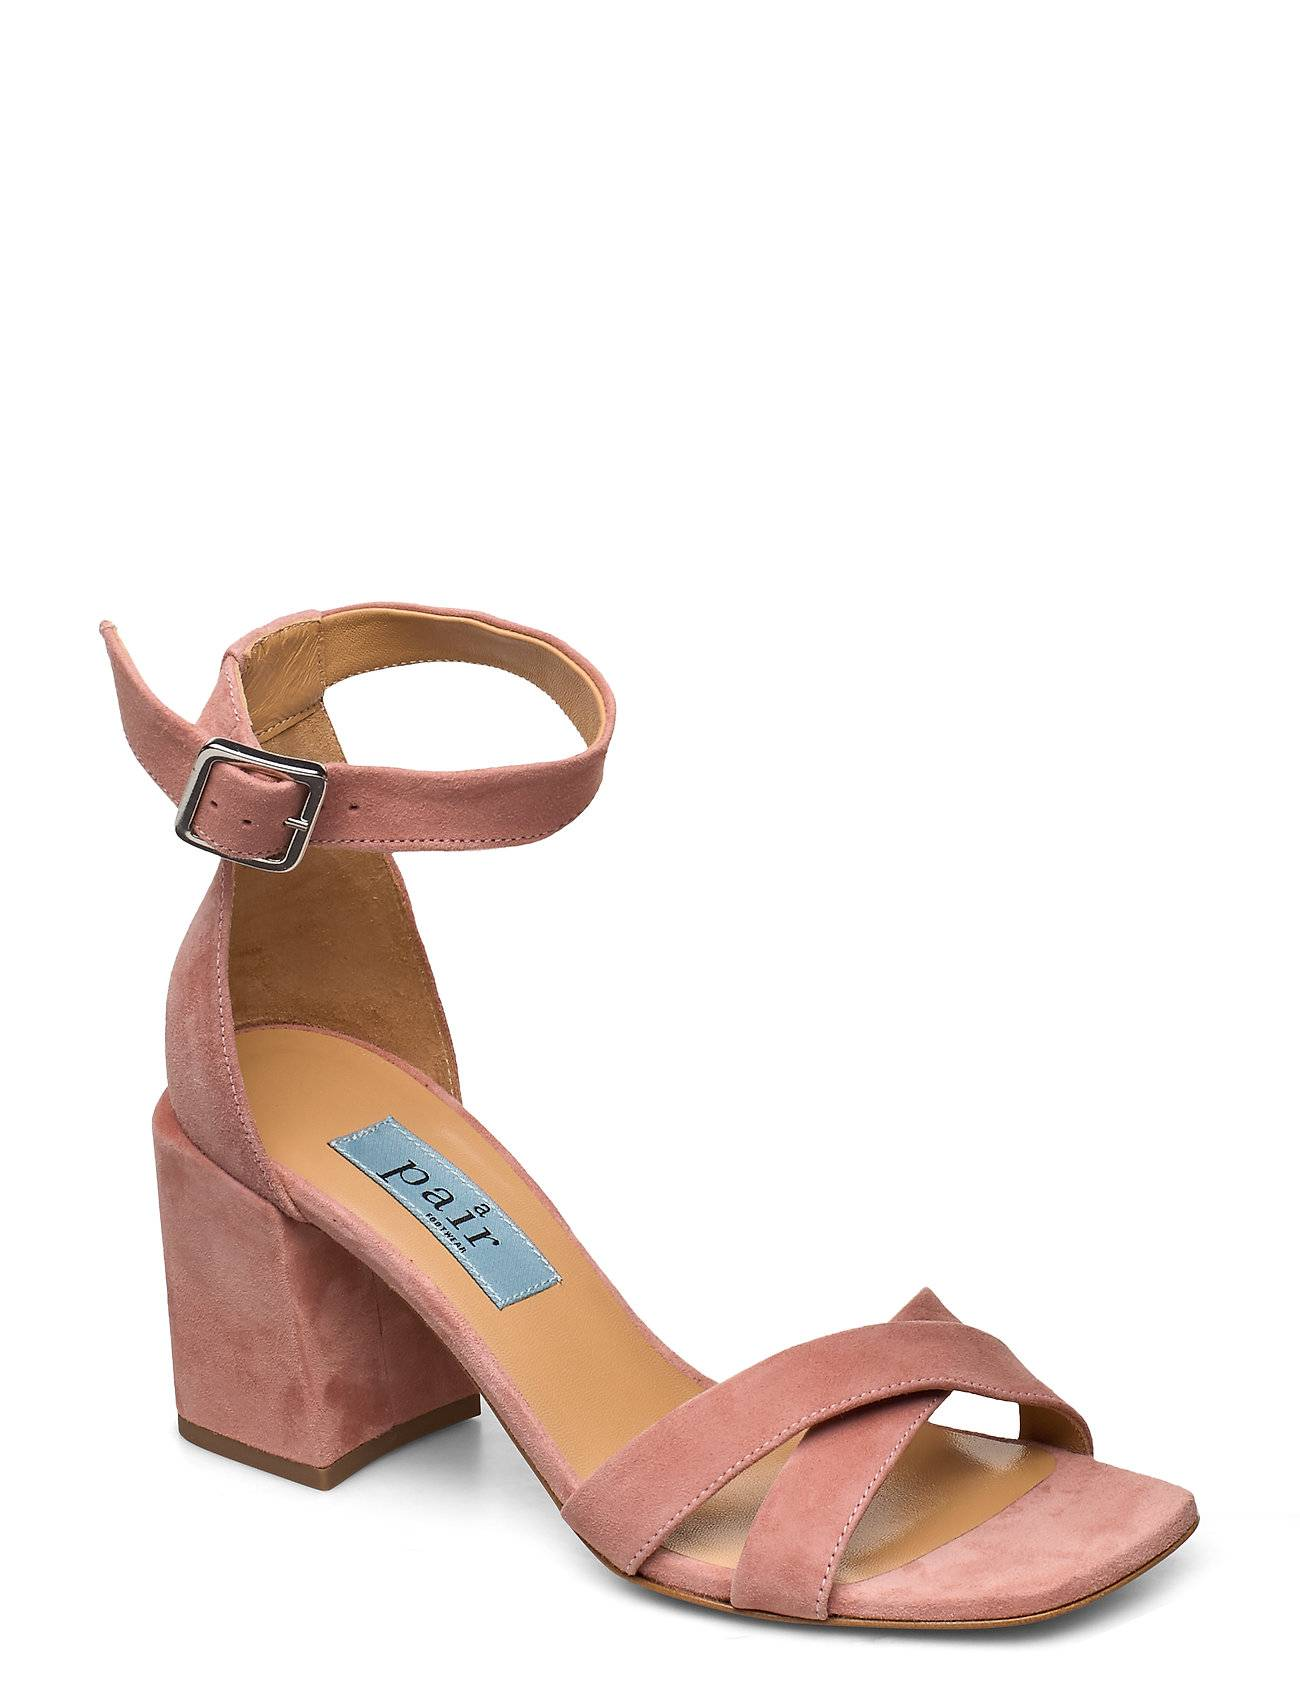 Apair High Cross Chunky Square Korolliset Sandaalit Vaaleanpunainen Apair